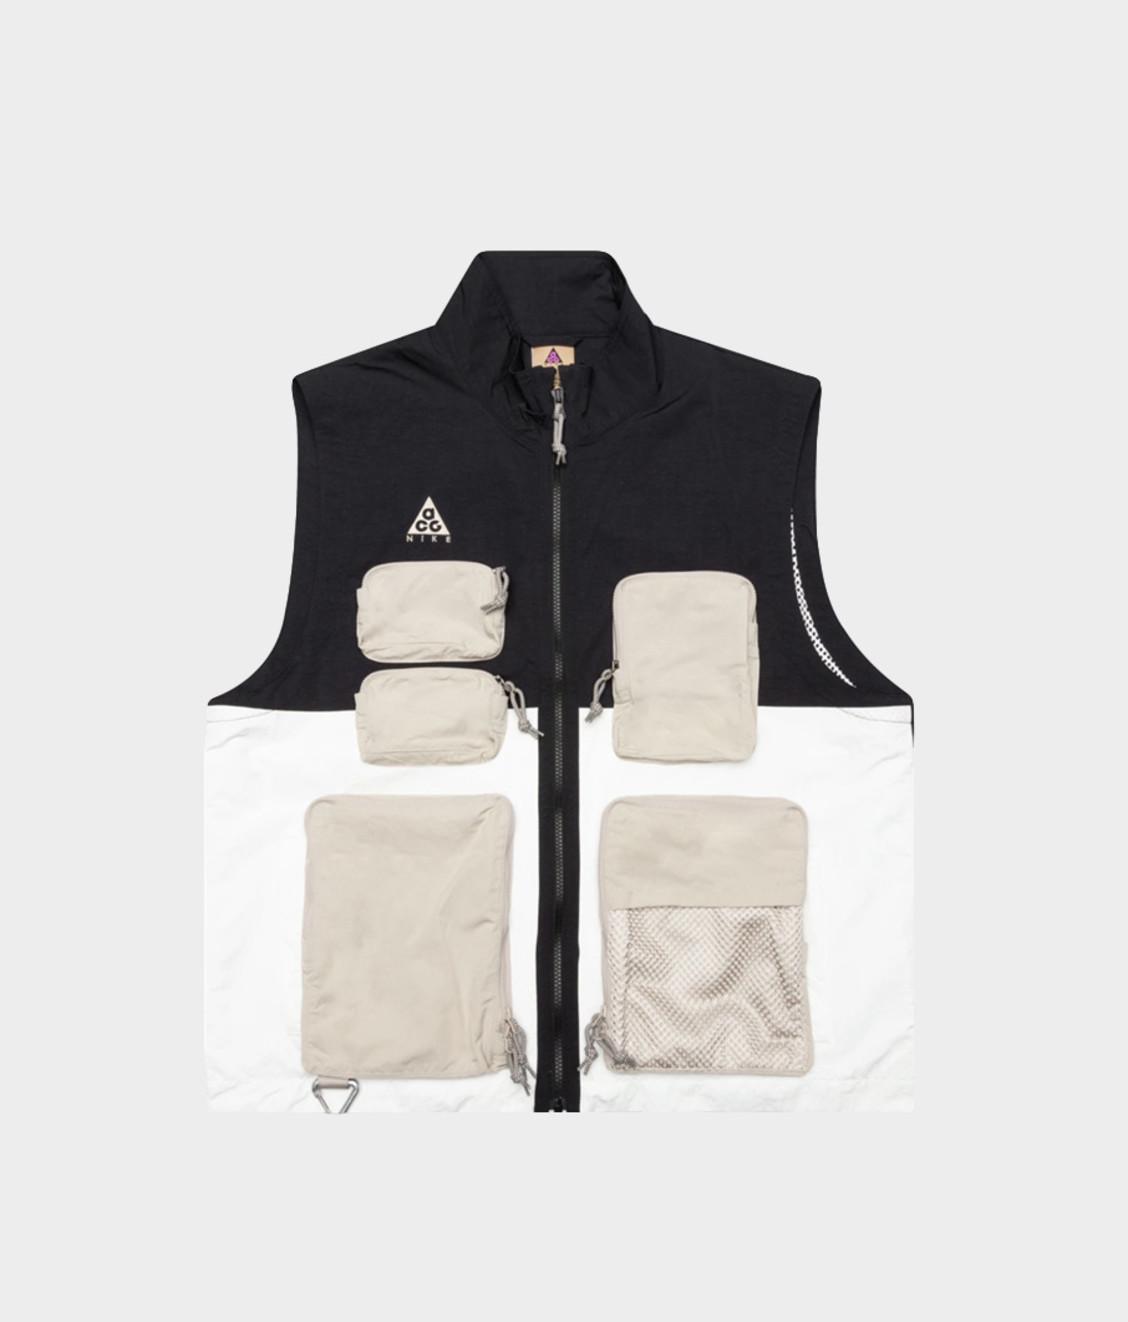 Nike Nike ACG Vest Black White